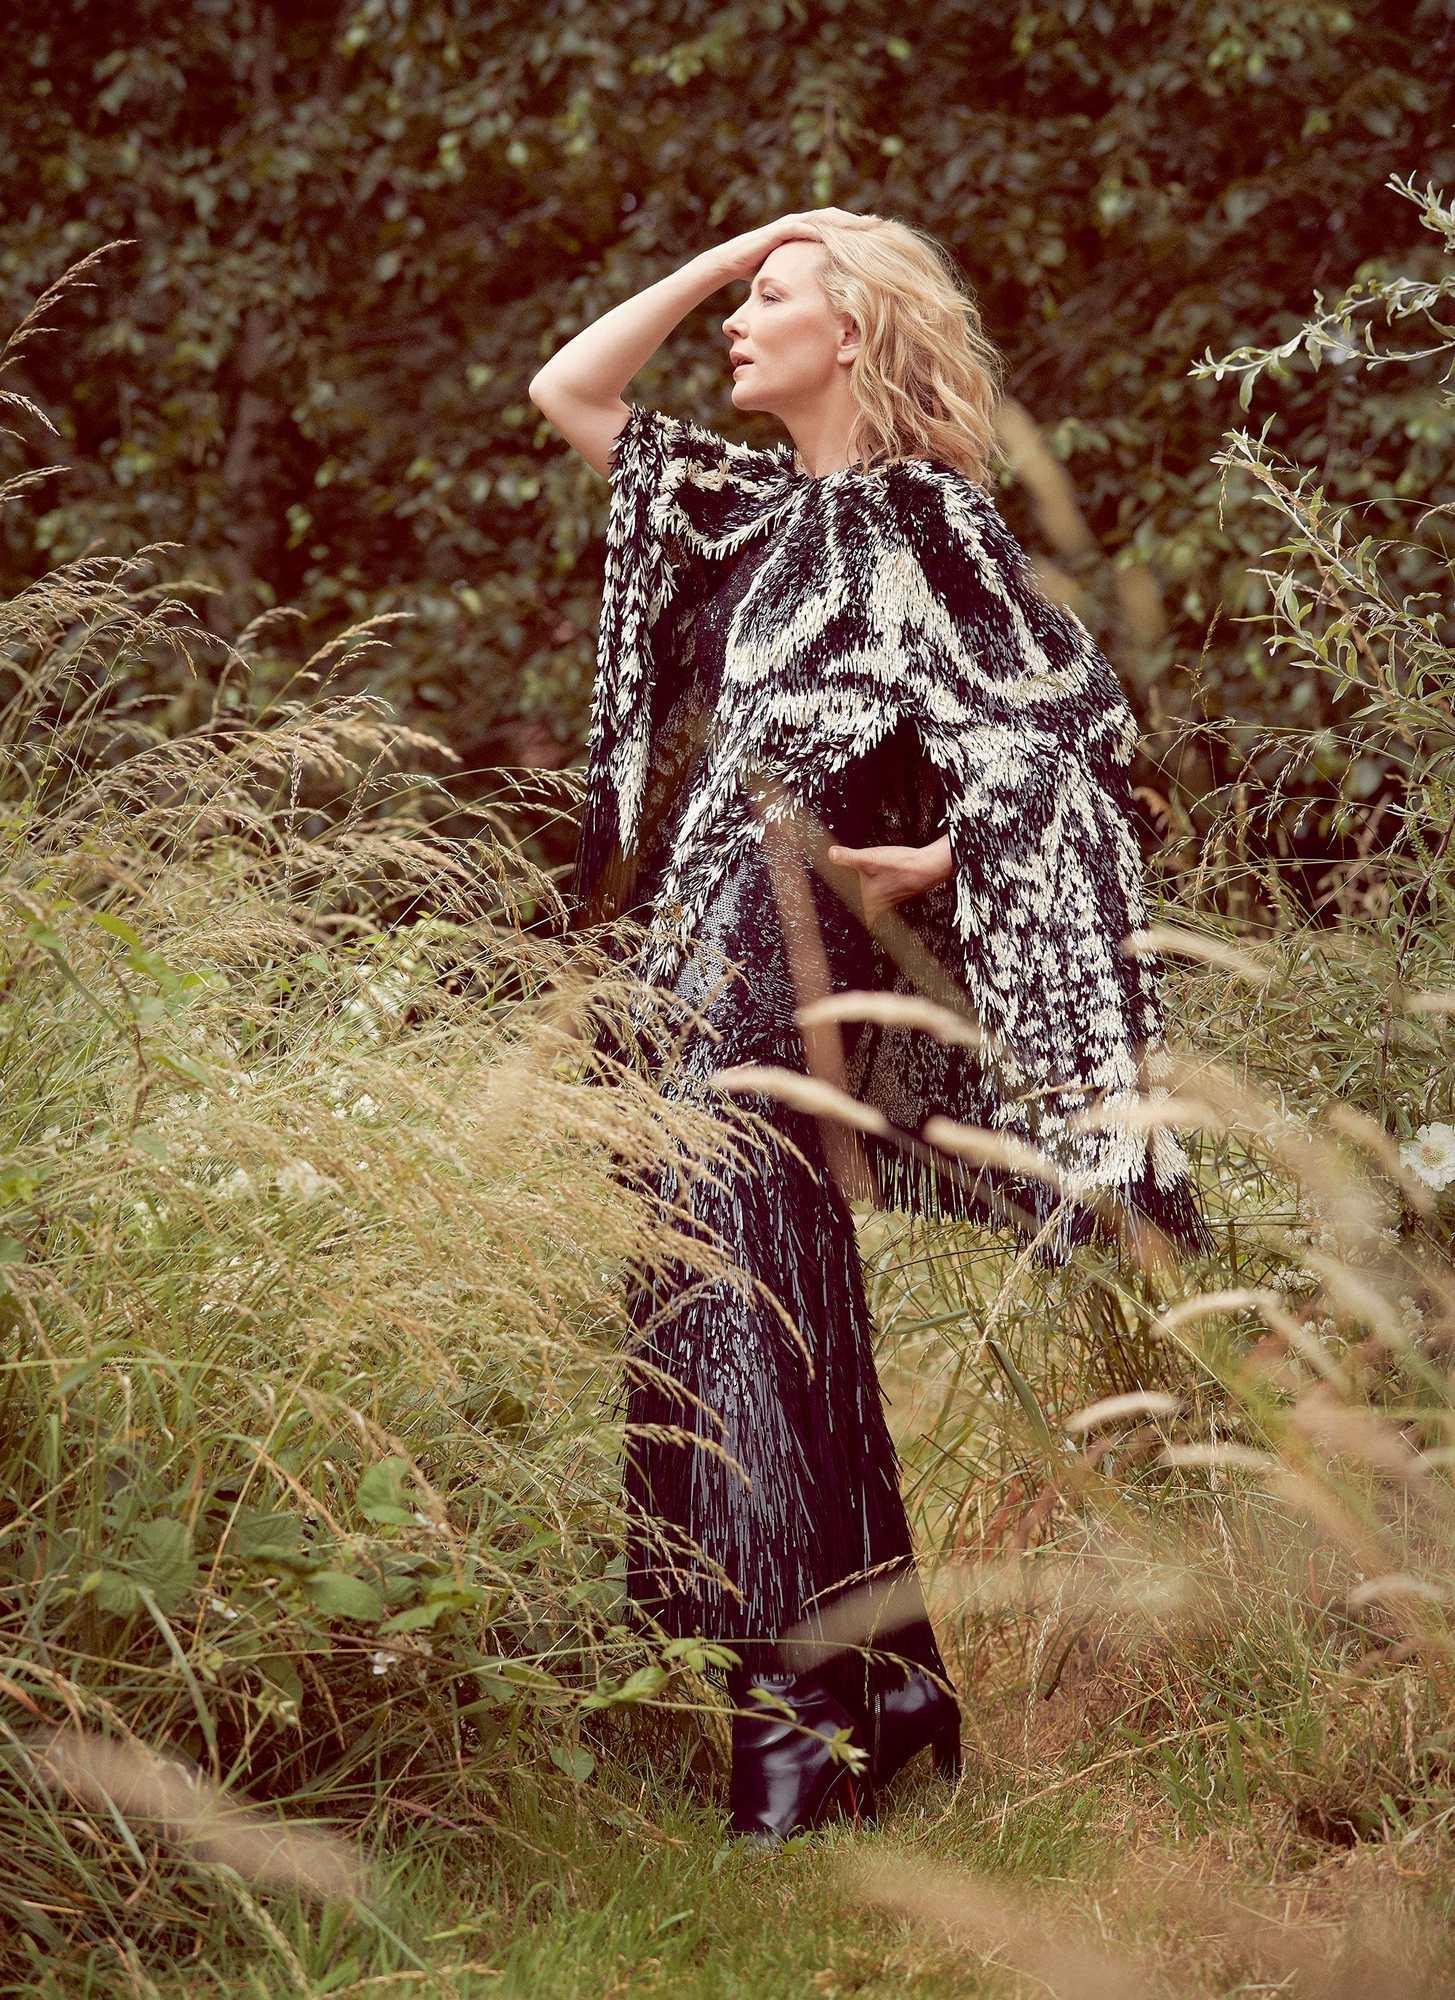 Cate-Blanchett-UK-Harper's-Bazaar-October-201871e1de959145784.jpg